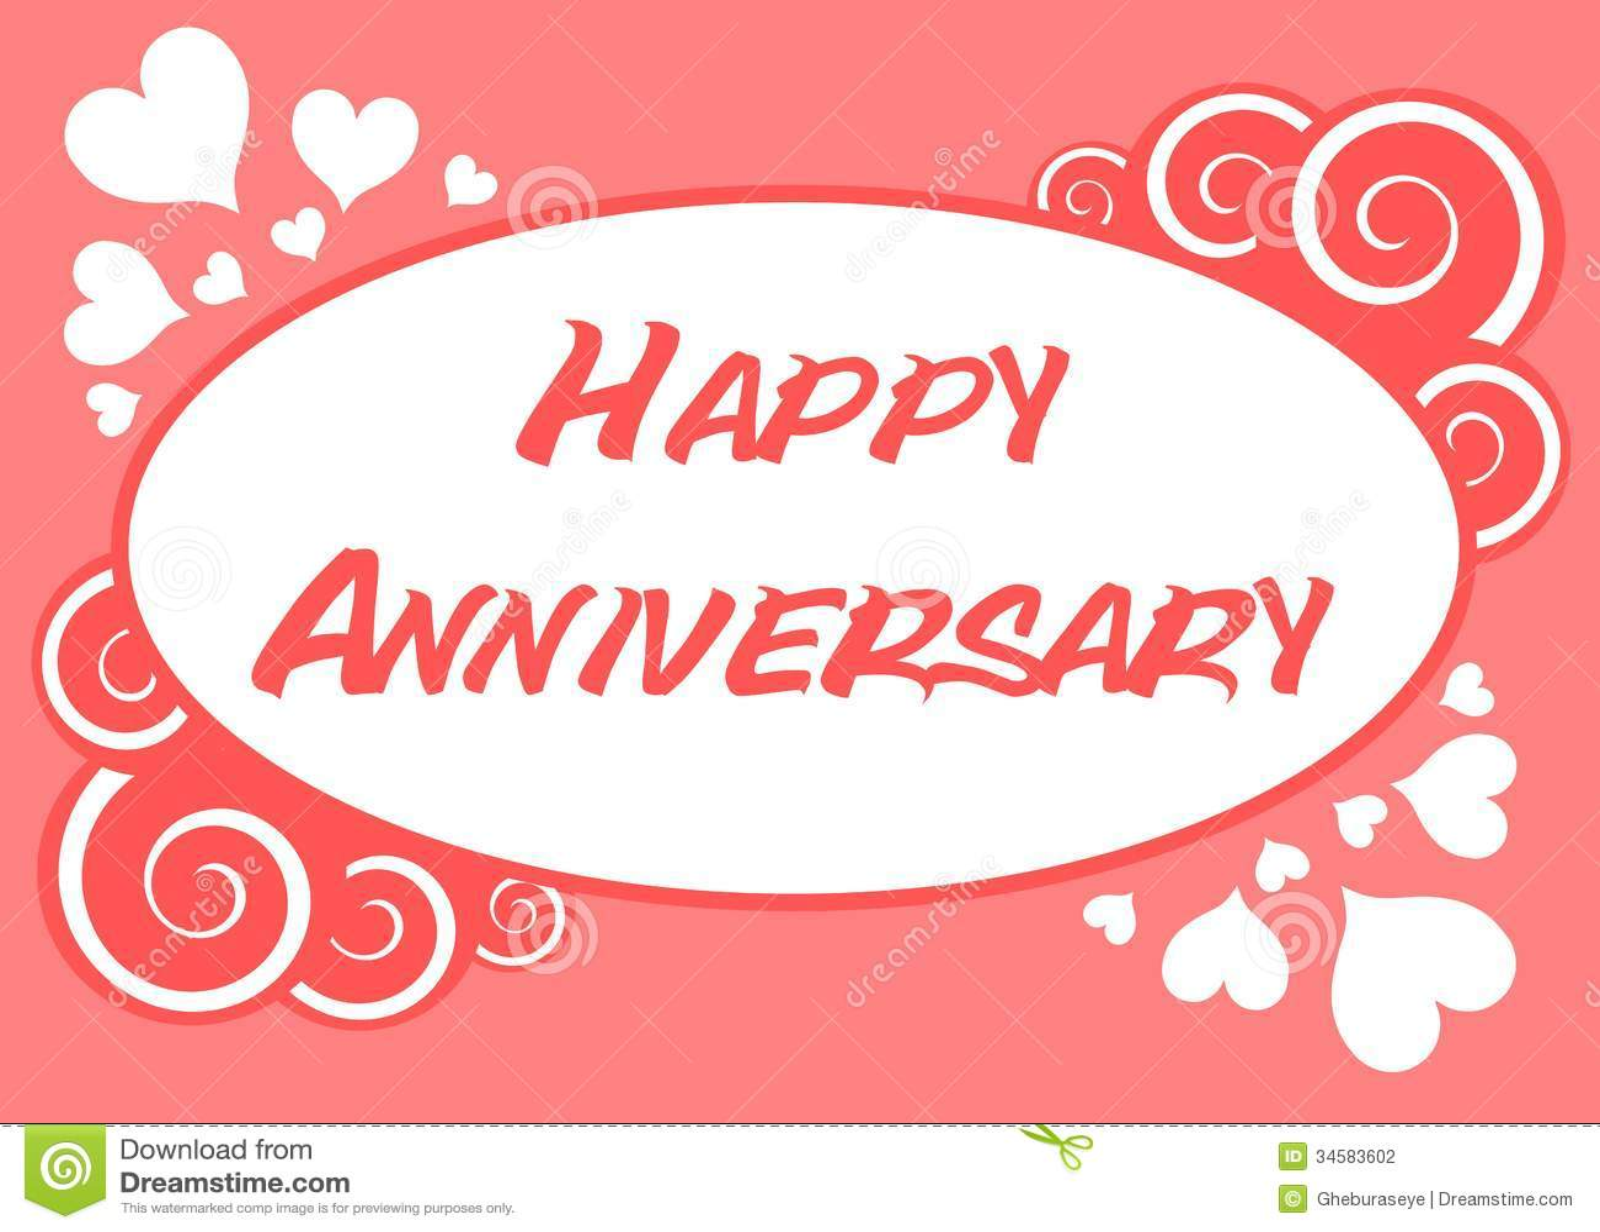 Happy Anniversary Stock Vector. Illustration Of